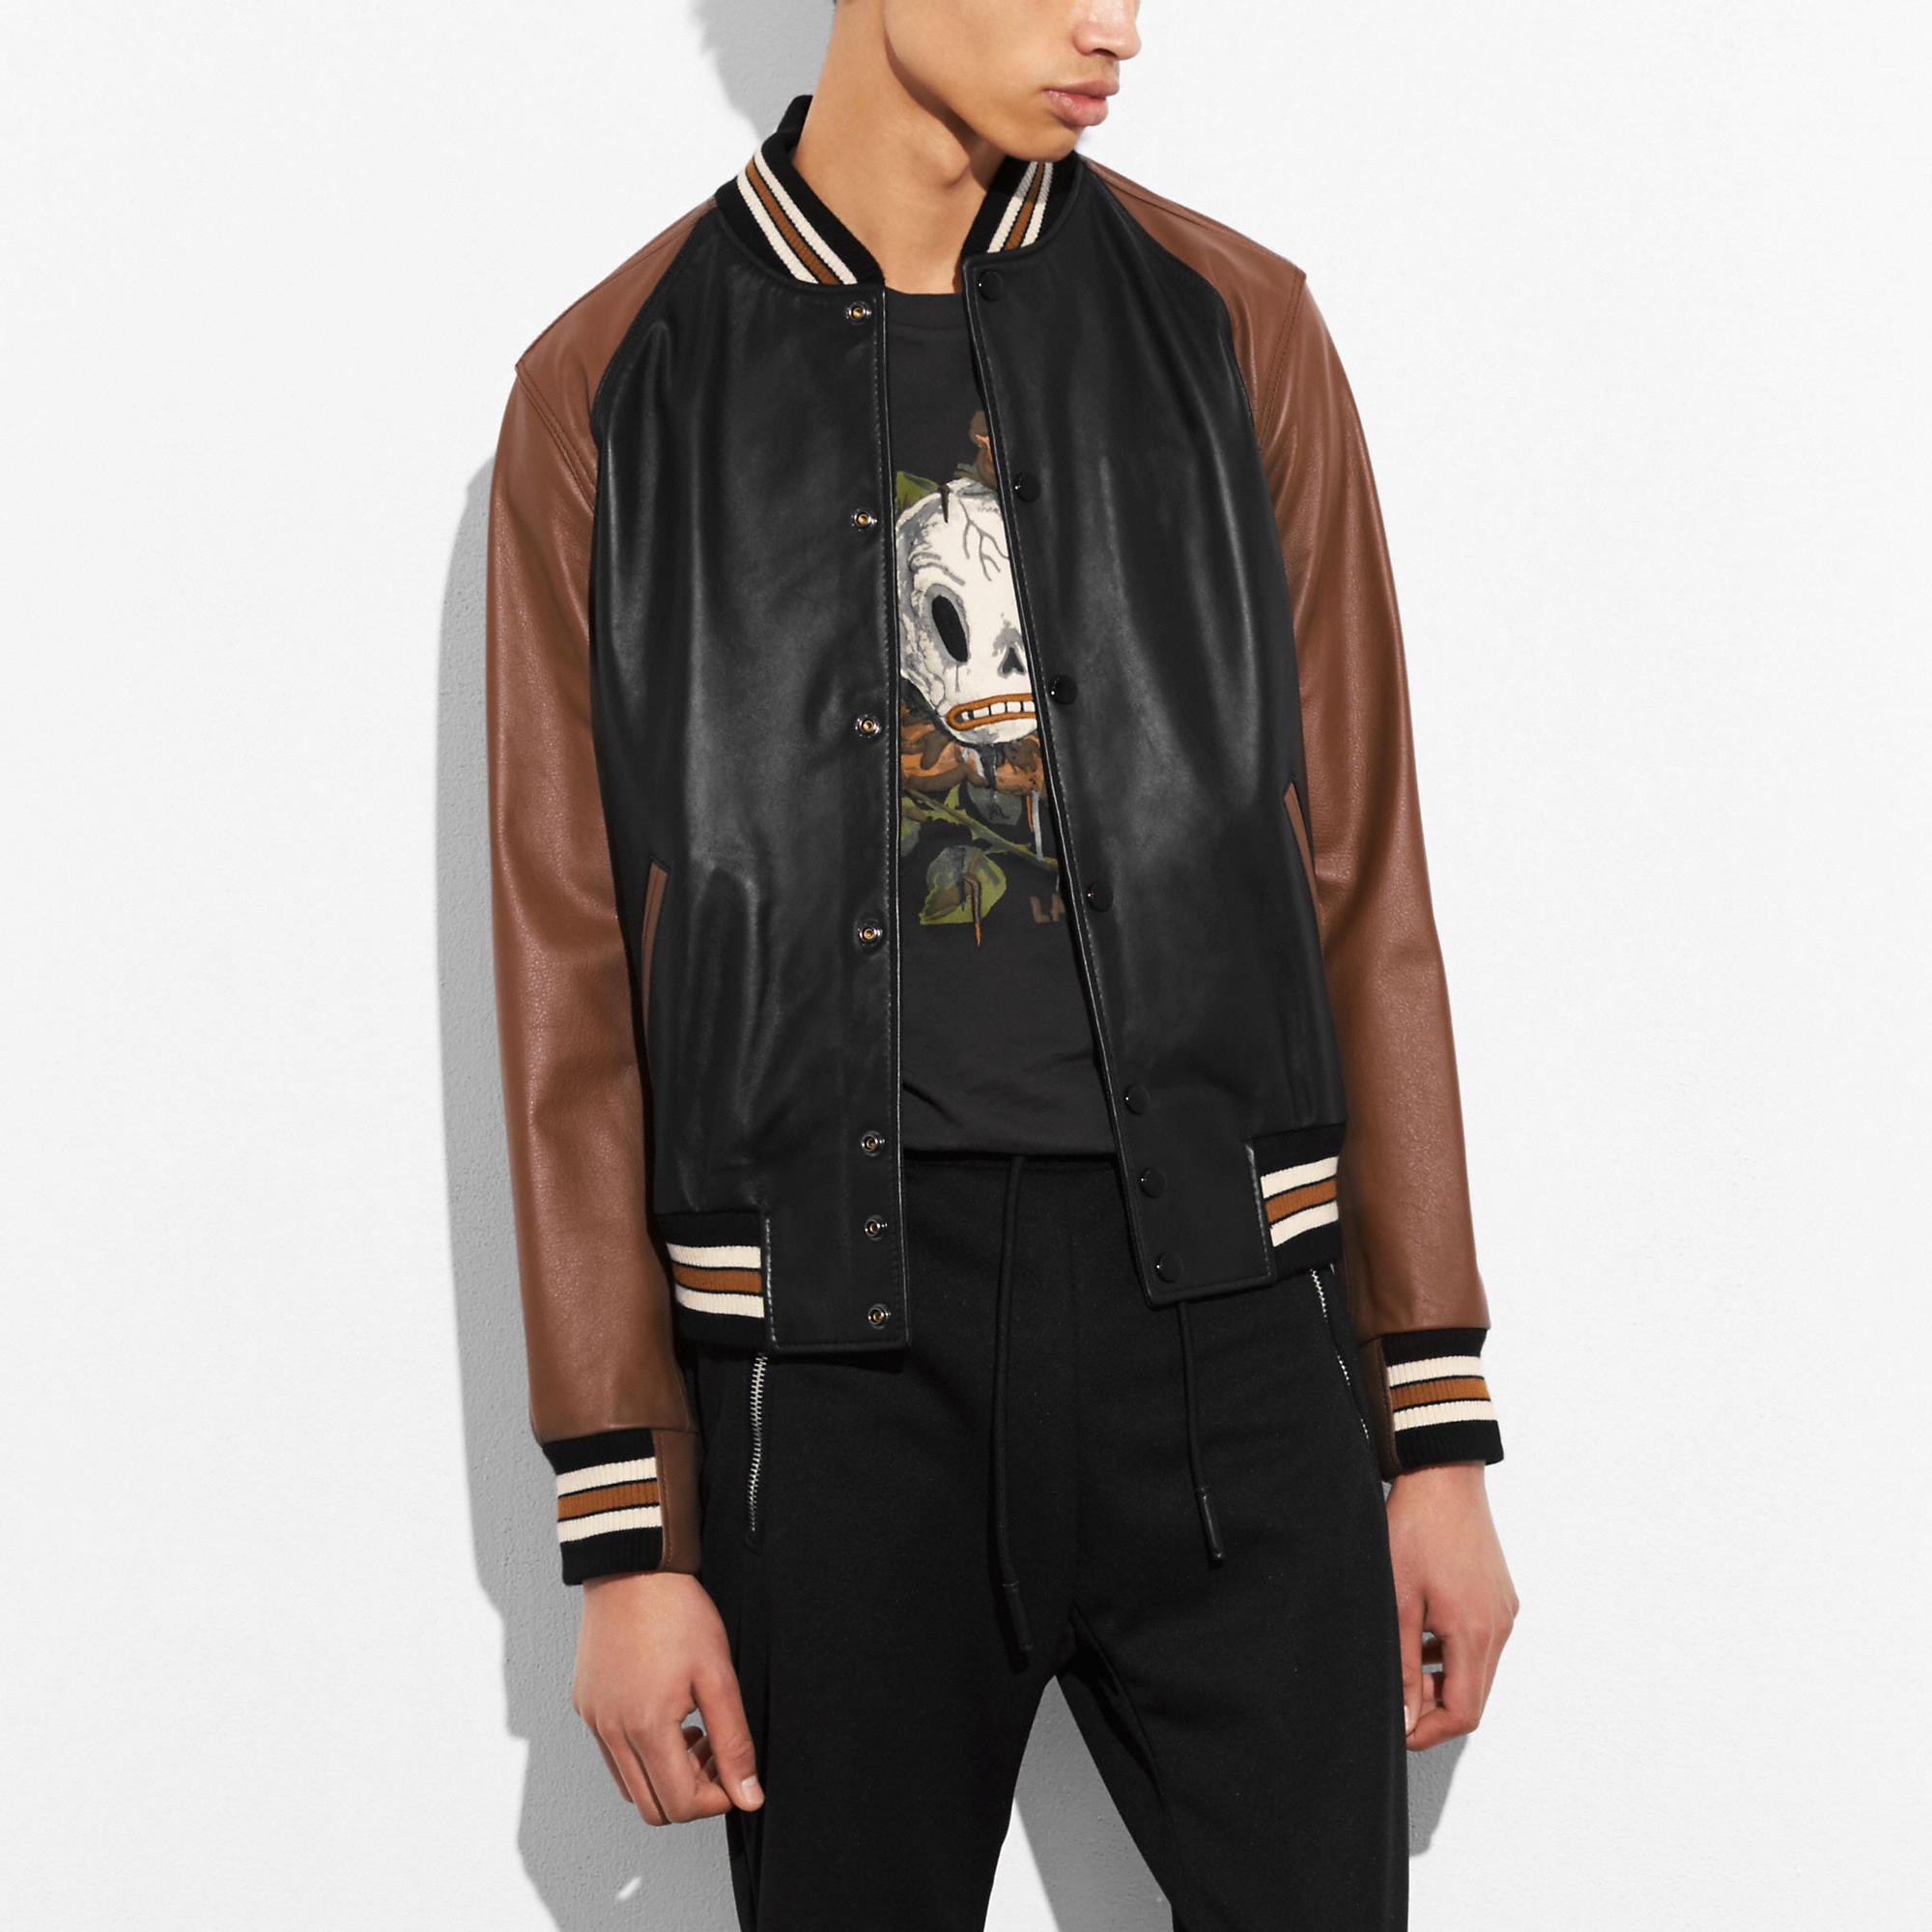 Coach Leather Varsity Jacket In Black/tan